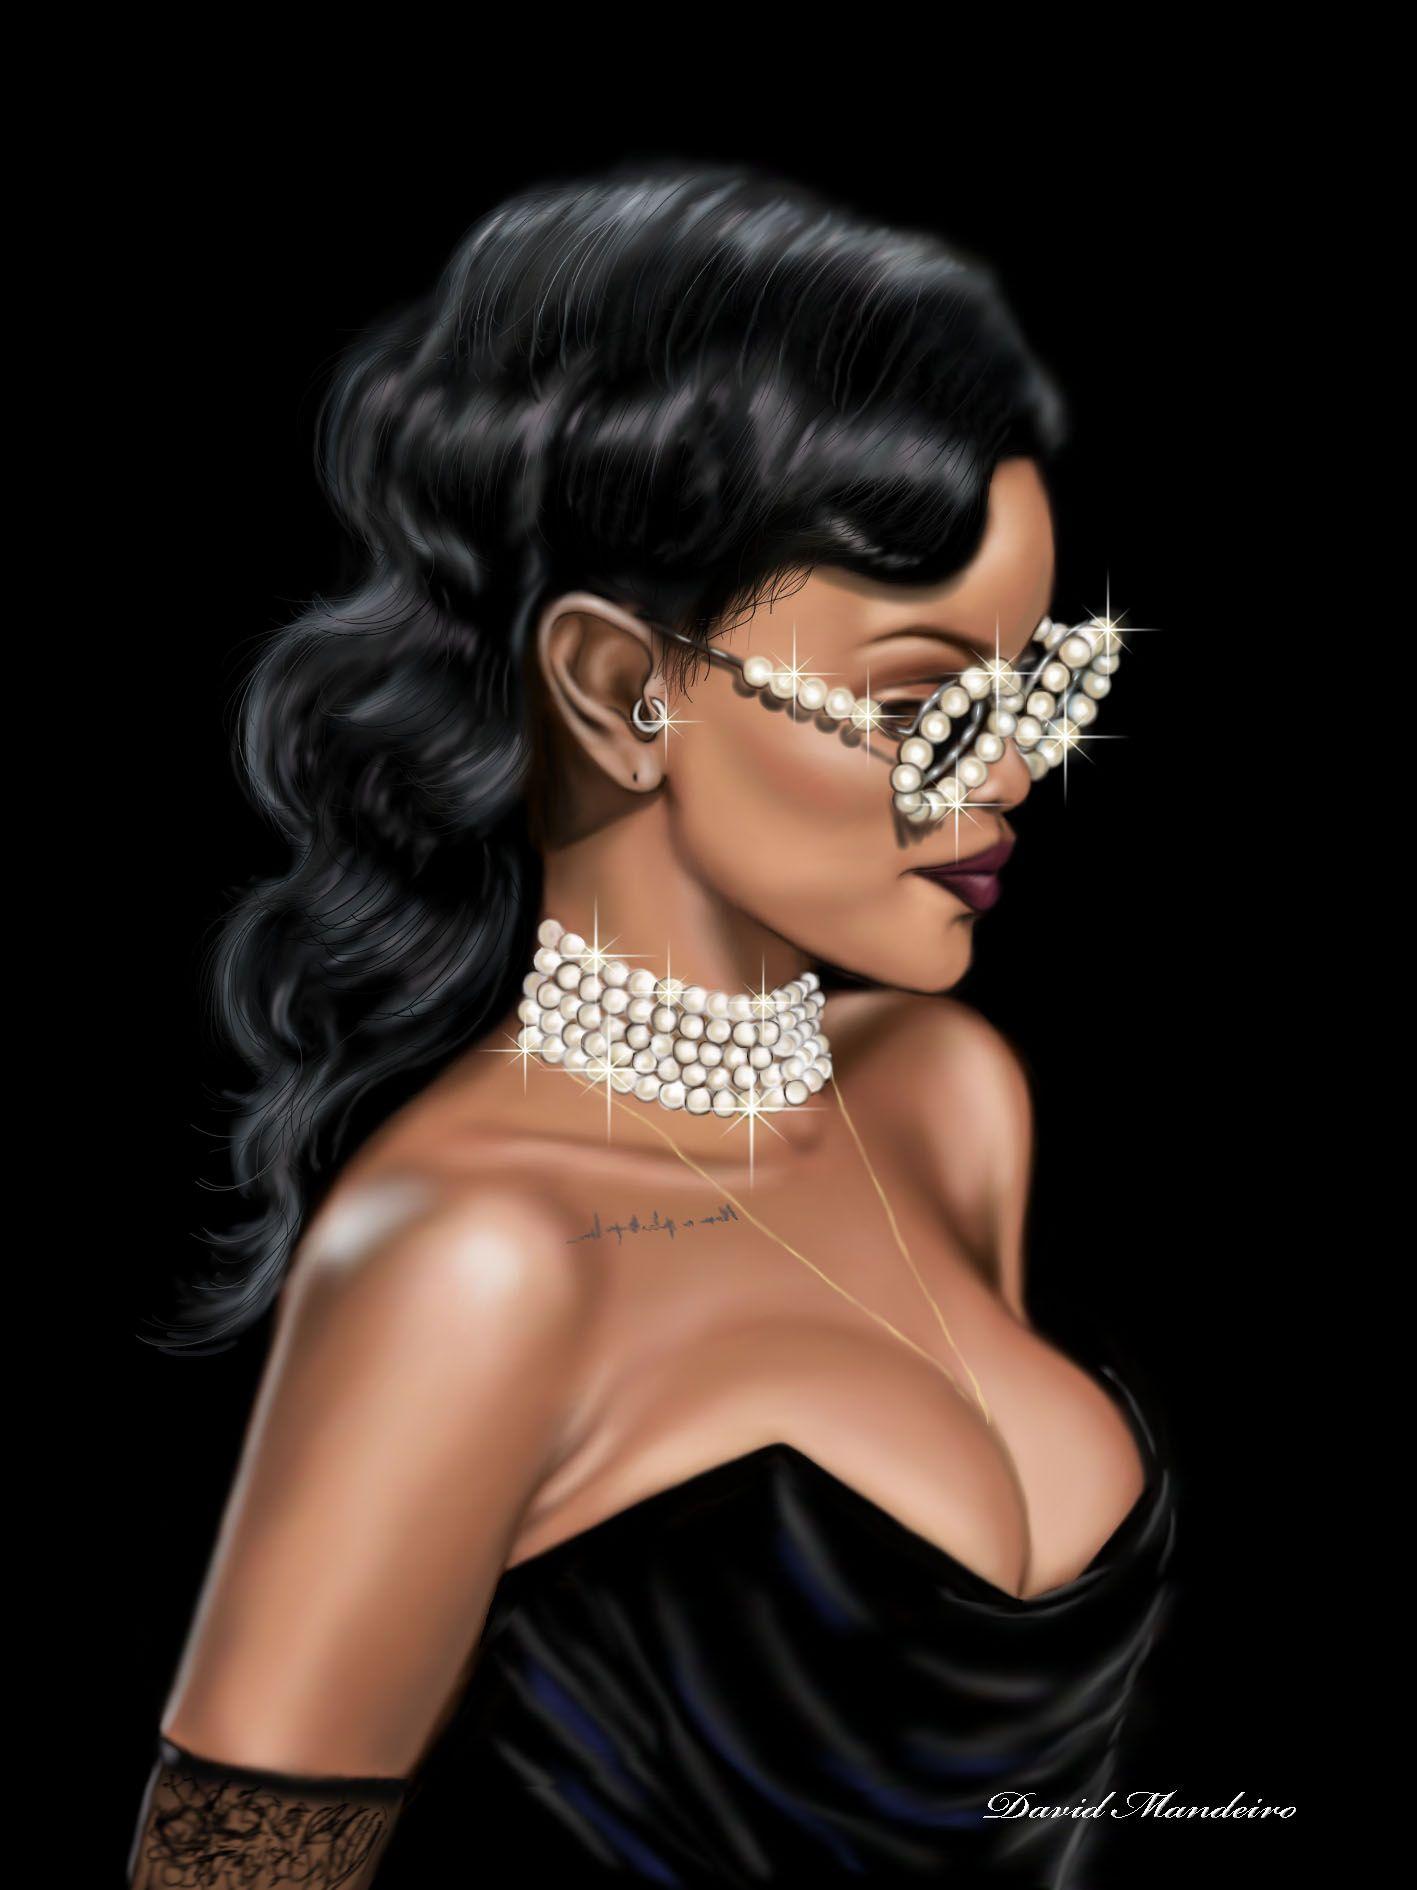 Rihanna iphone wallpaper tumblr - Rihanna In Vivienne Westwood At Victoria S Secret Fashion Show By David Mandeiro Illustrations